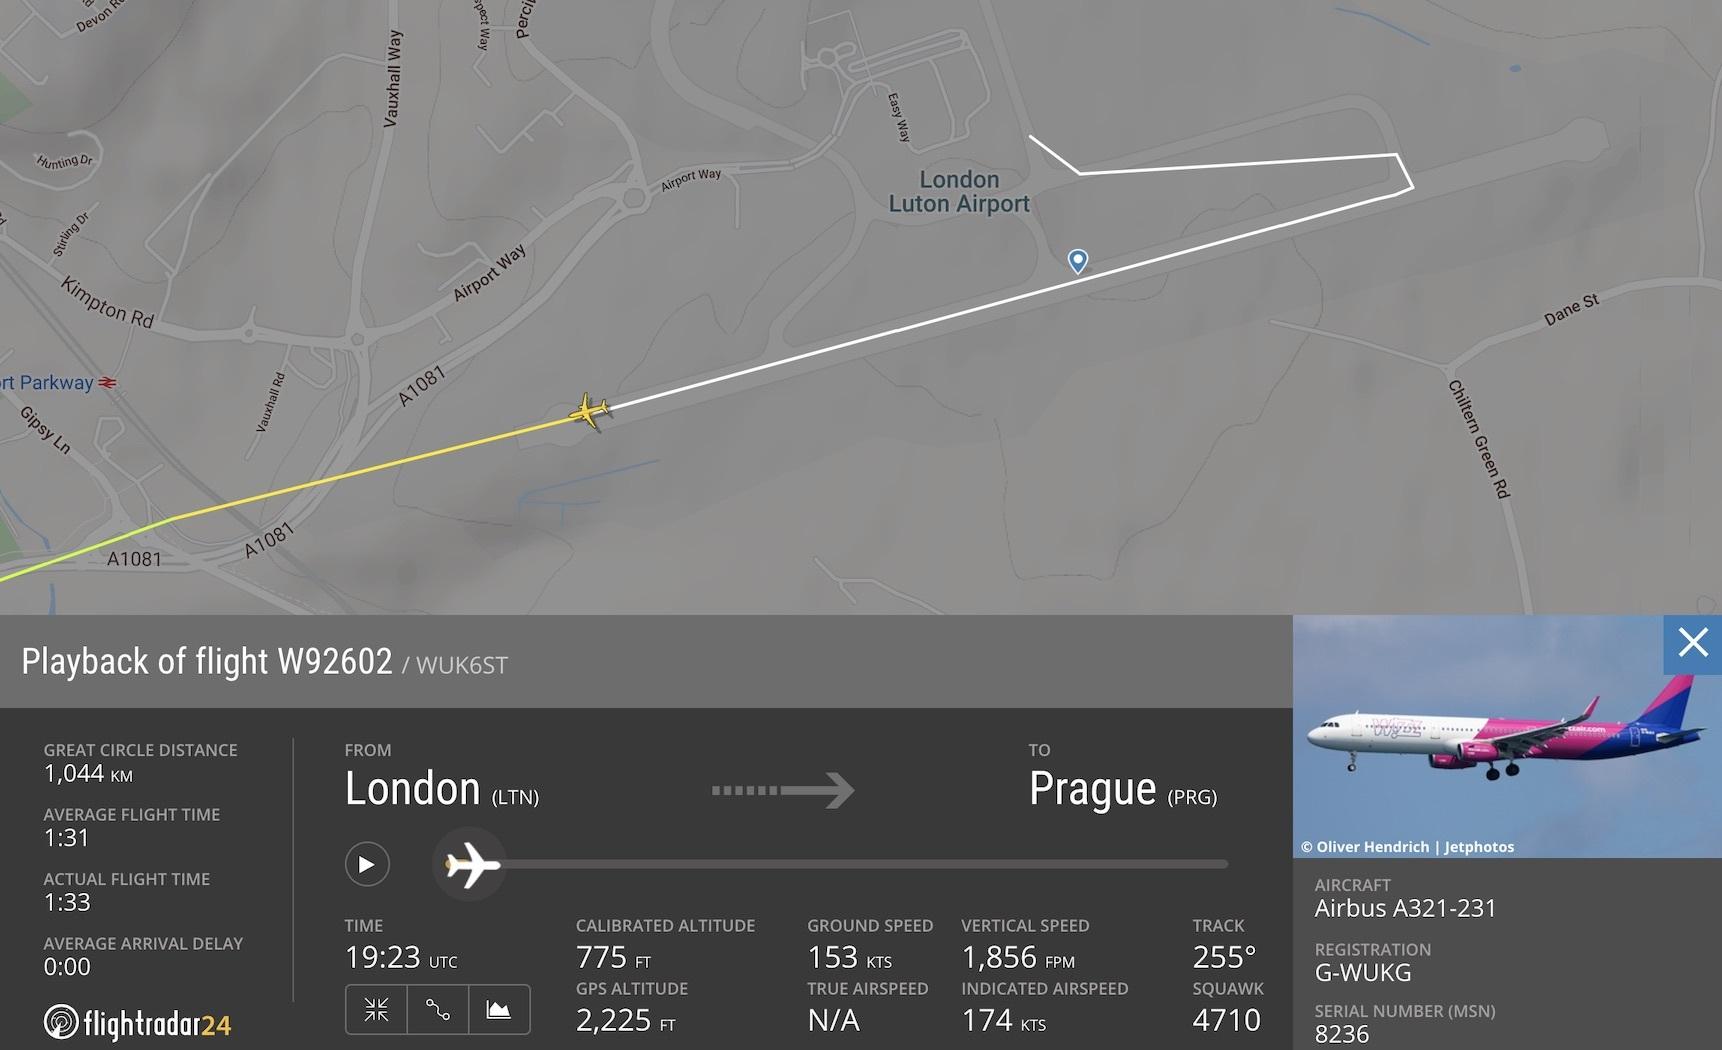 Wizz Air A321 departing Luton